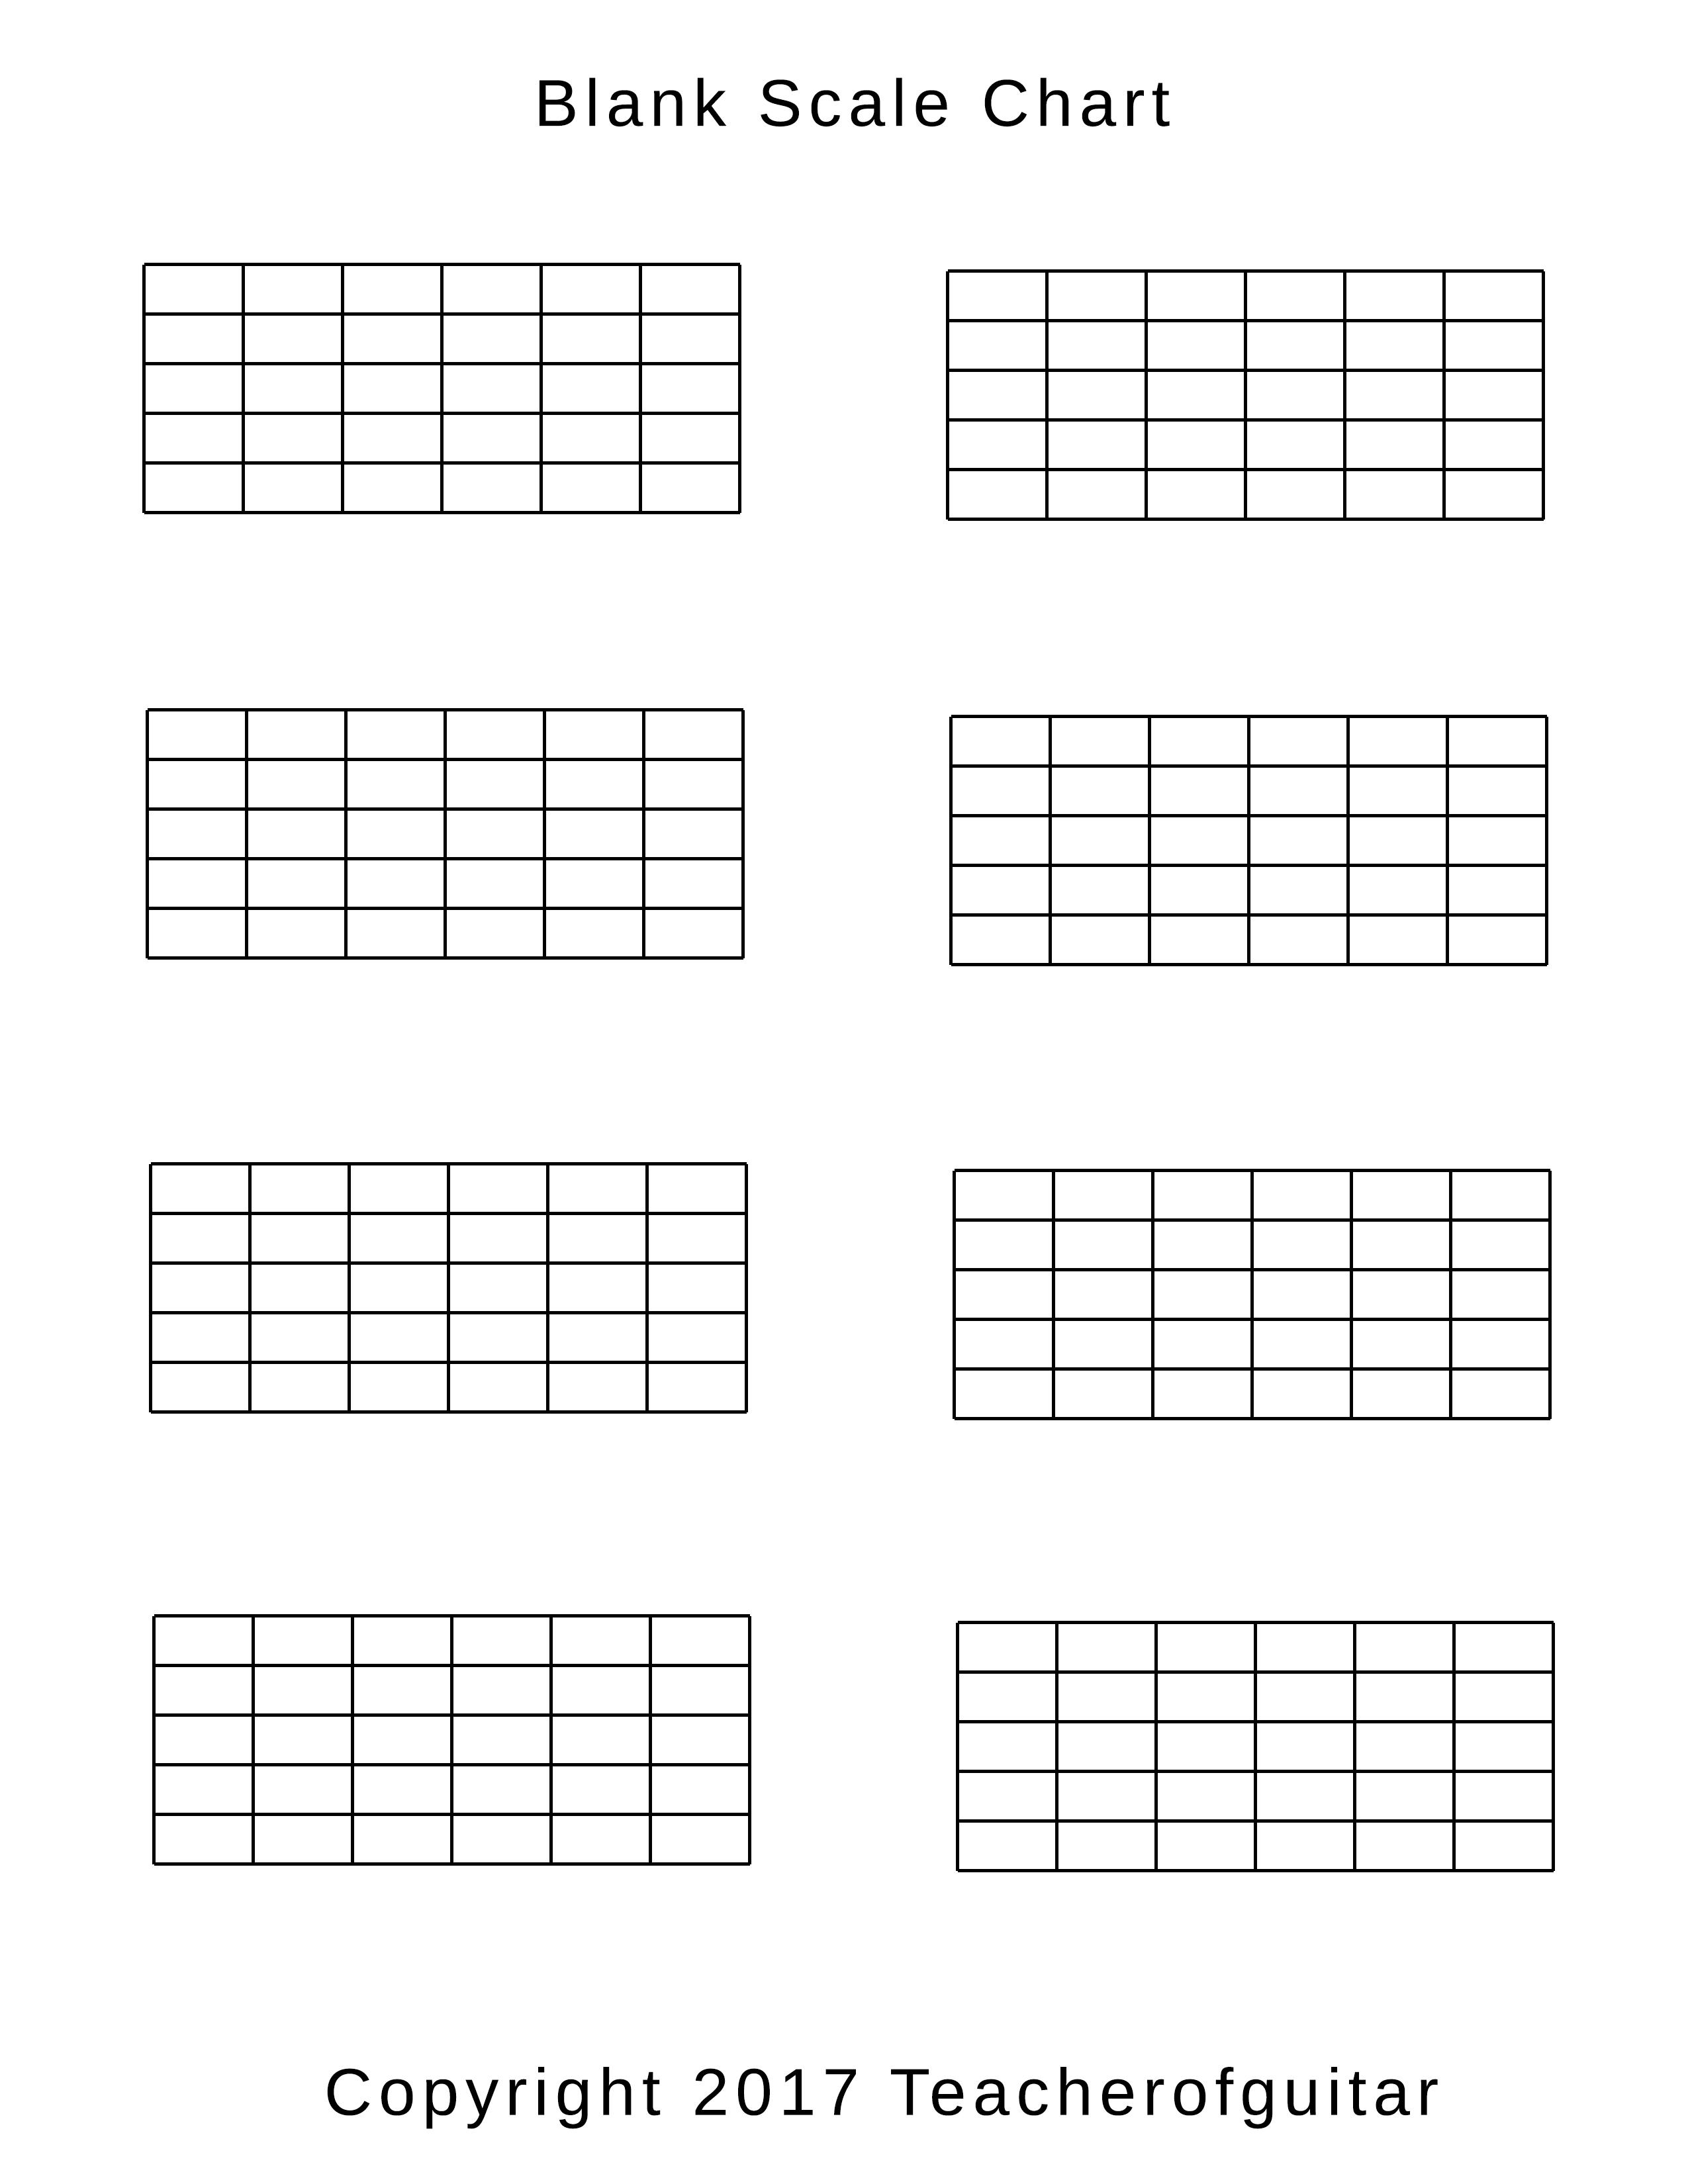 Blank Scale Chart - Teacher of Guitar